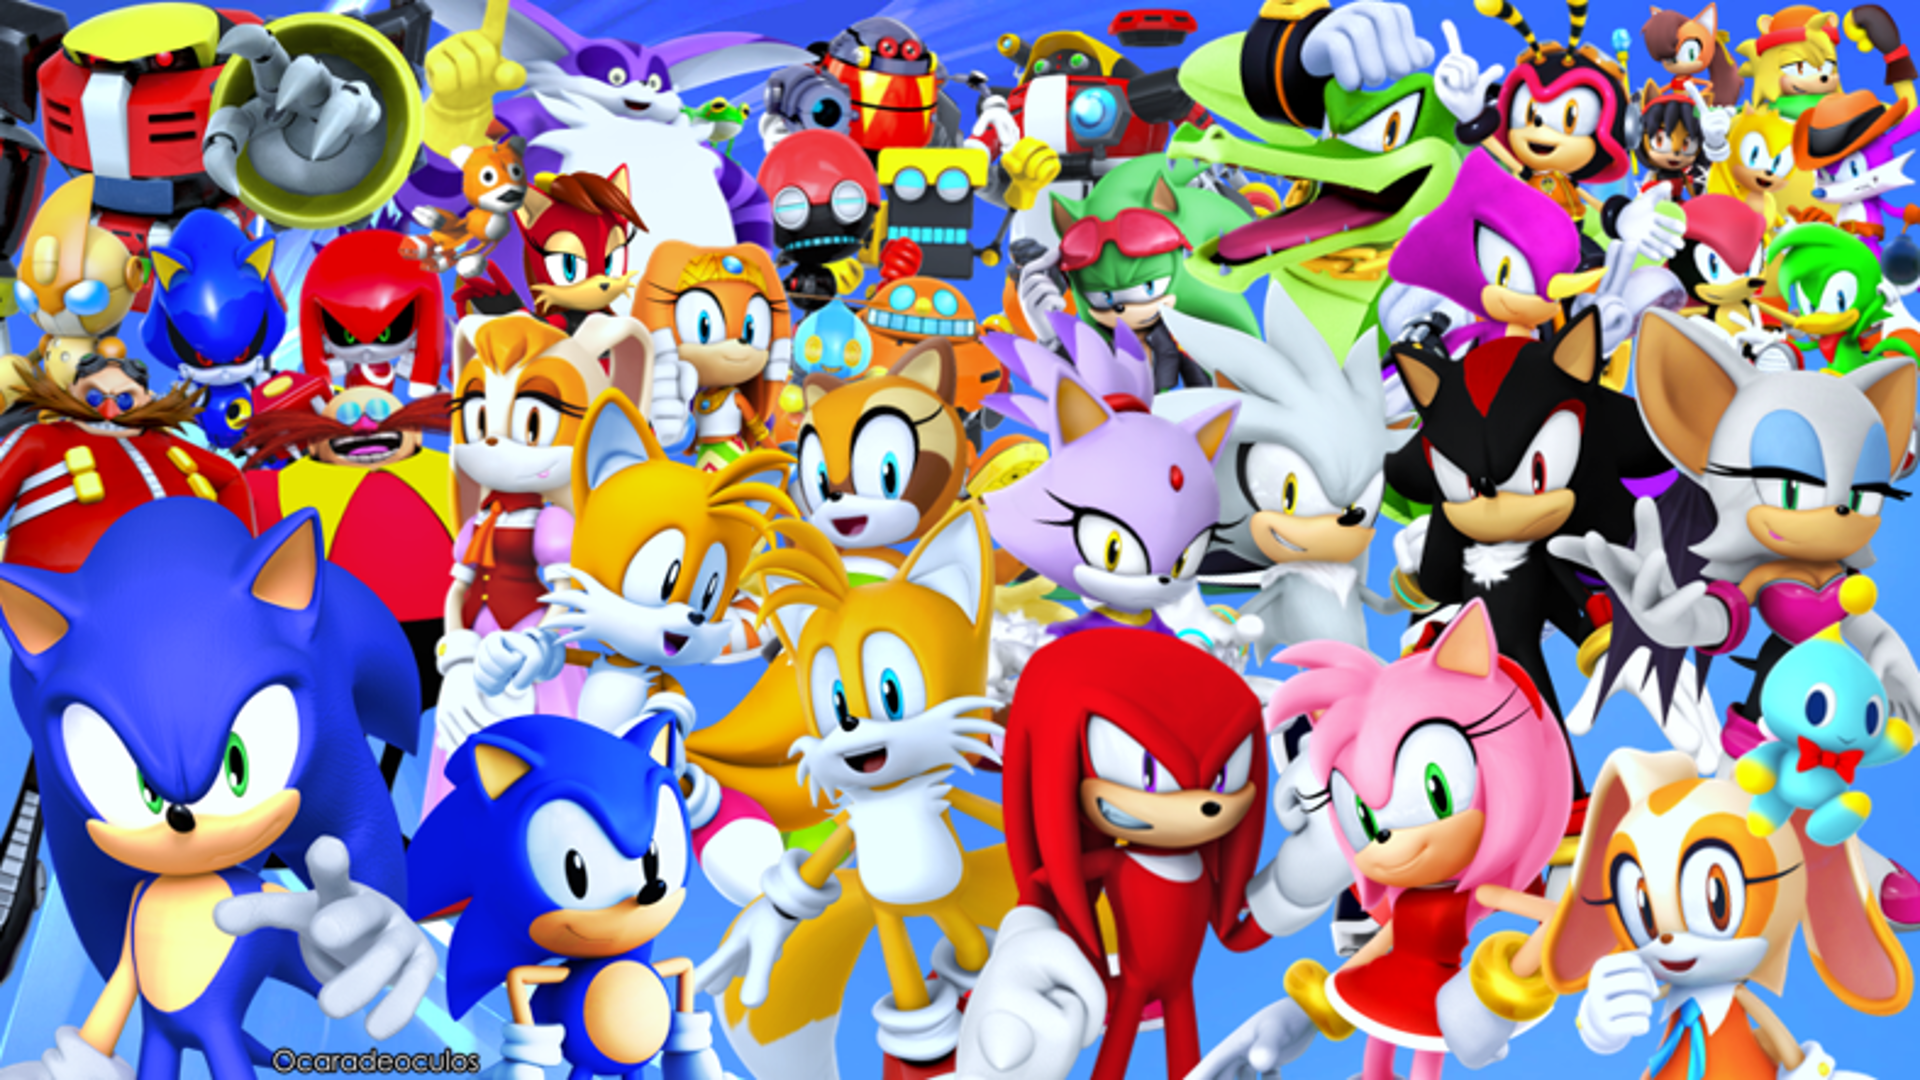 Sonic the Hedgehog Wallpaper by Ocaradeoculos on DeviantArt